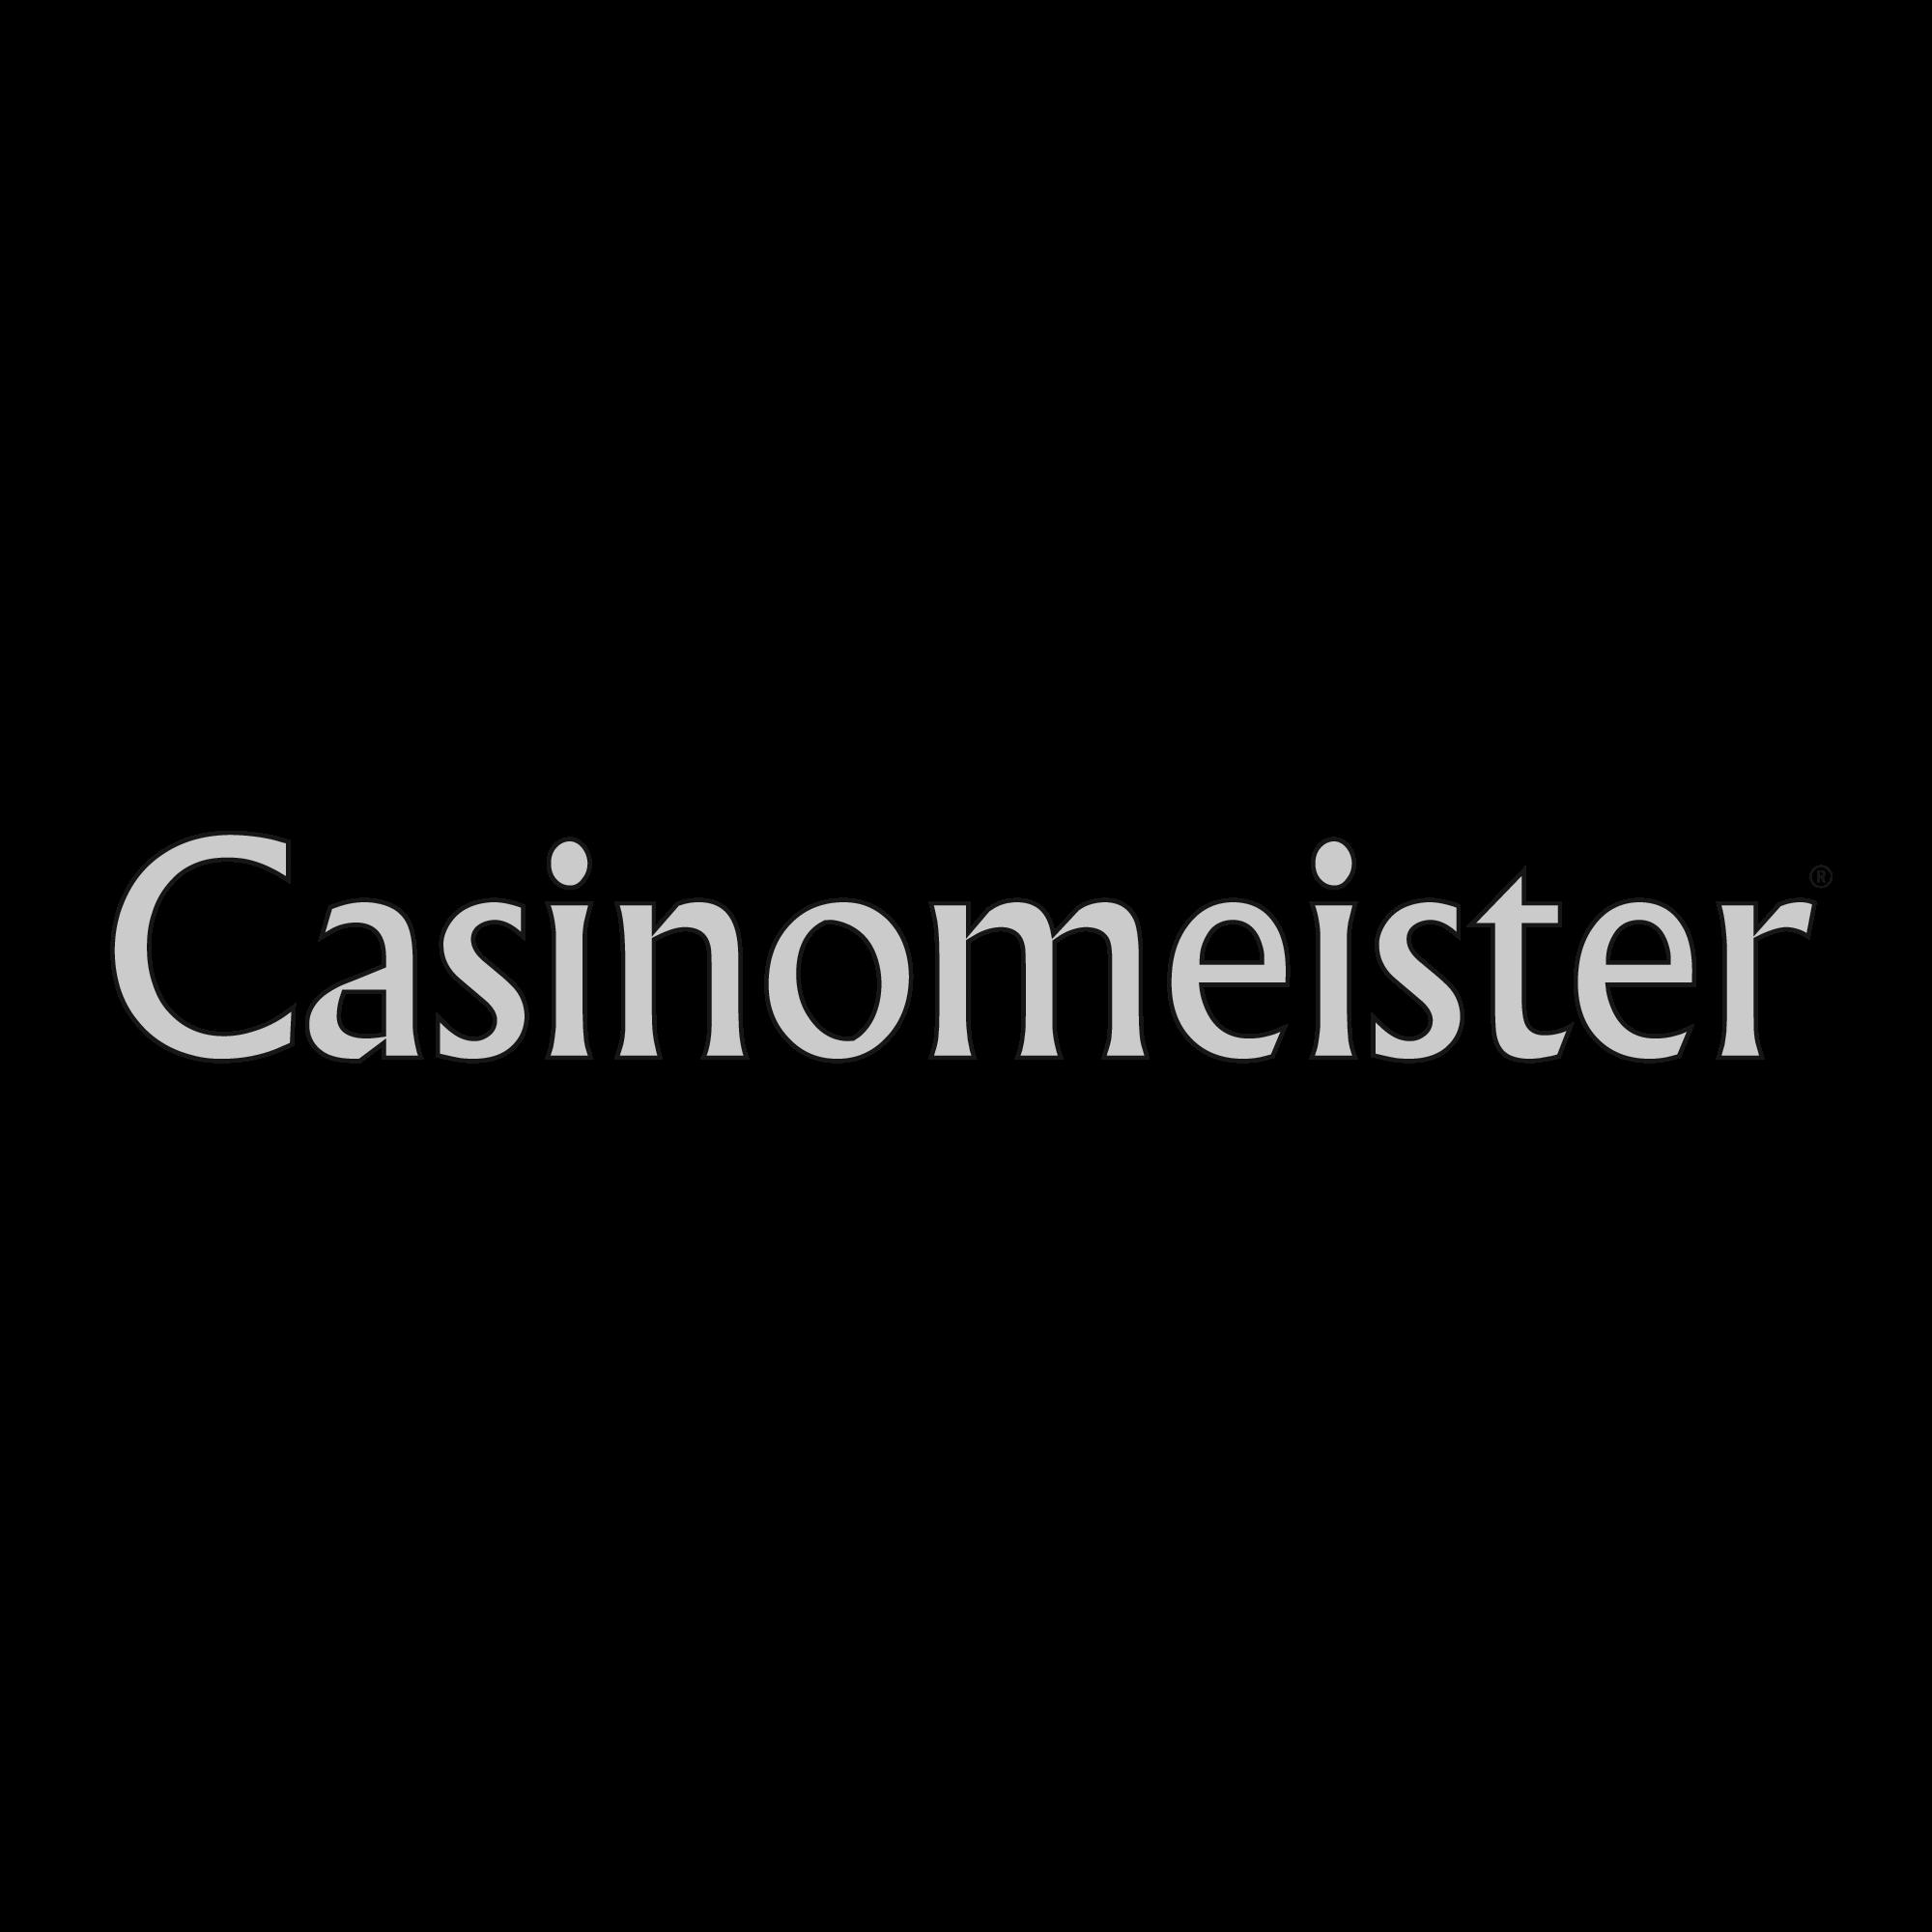 casinomeister_logo_bw